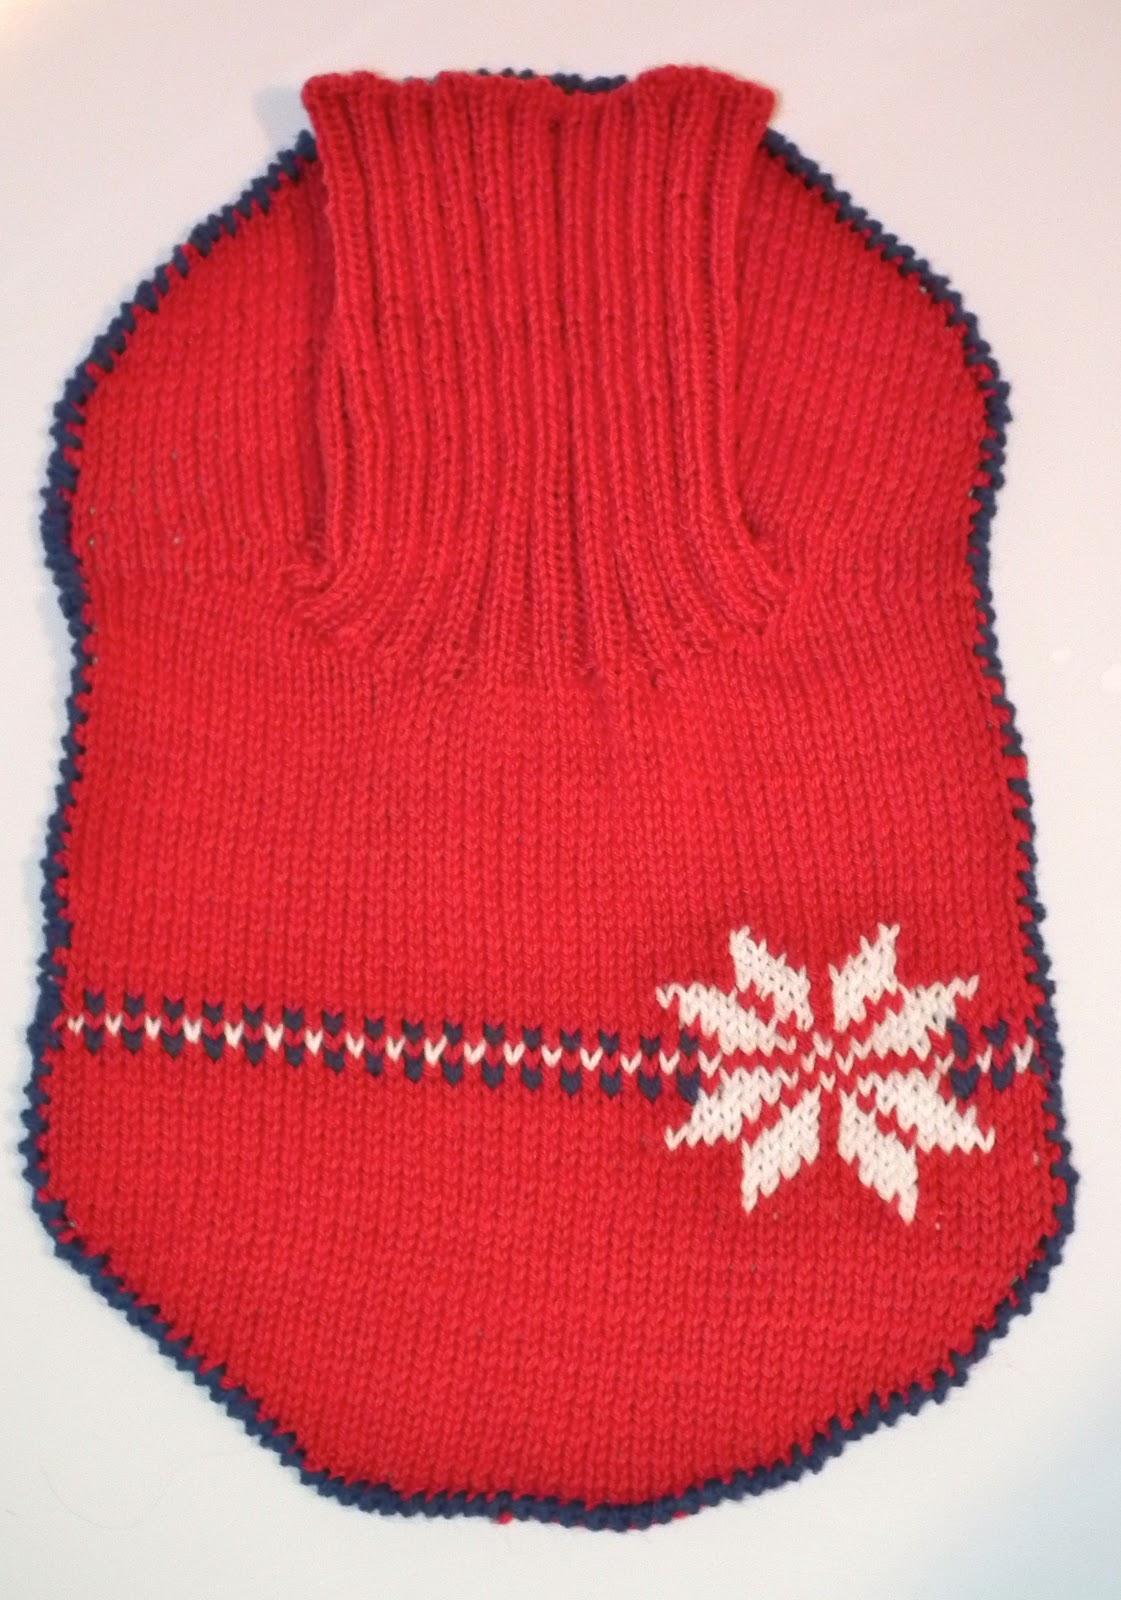 ra-mi: Kids Neck Warmer (free pattern)